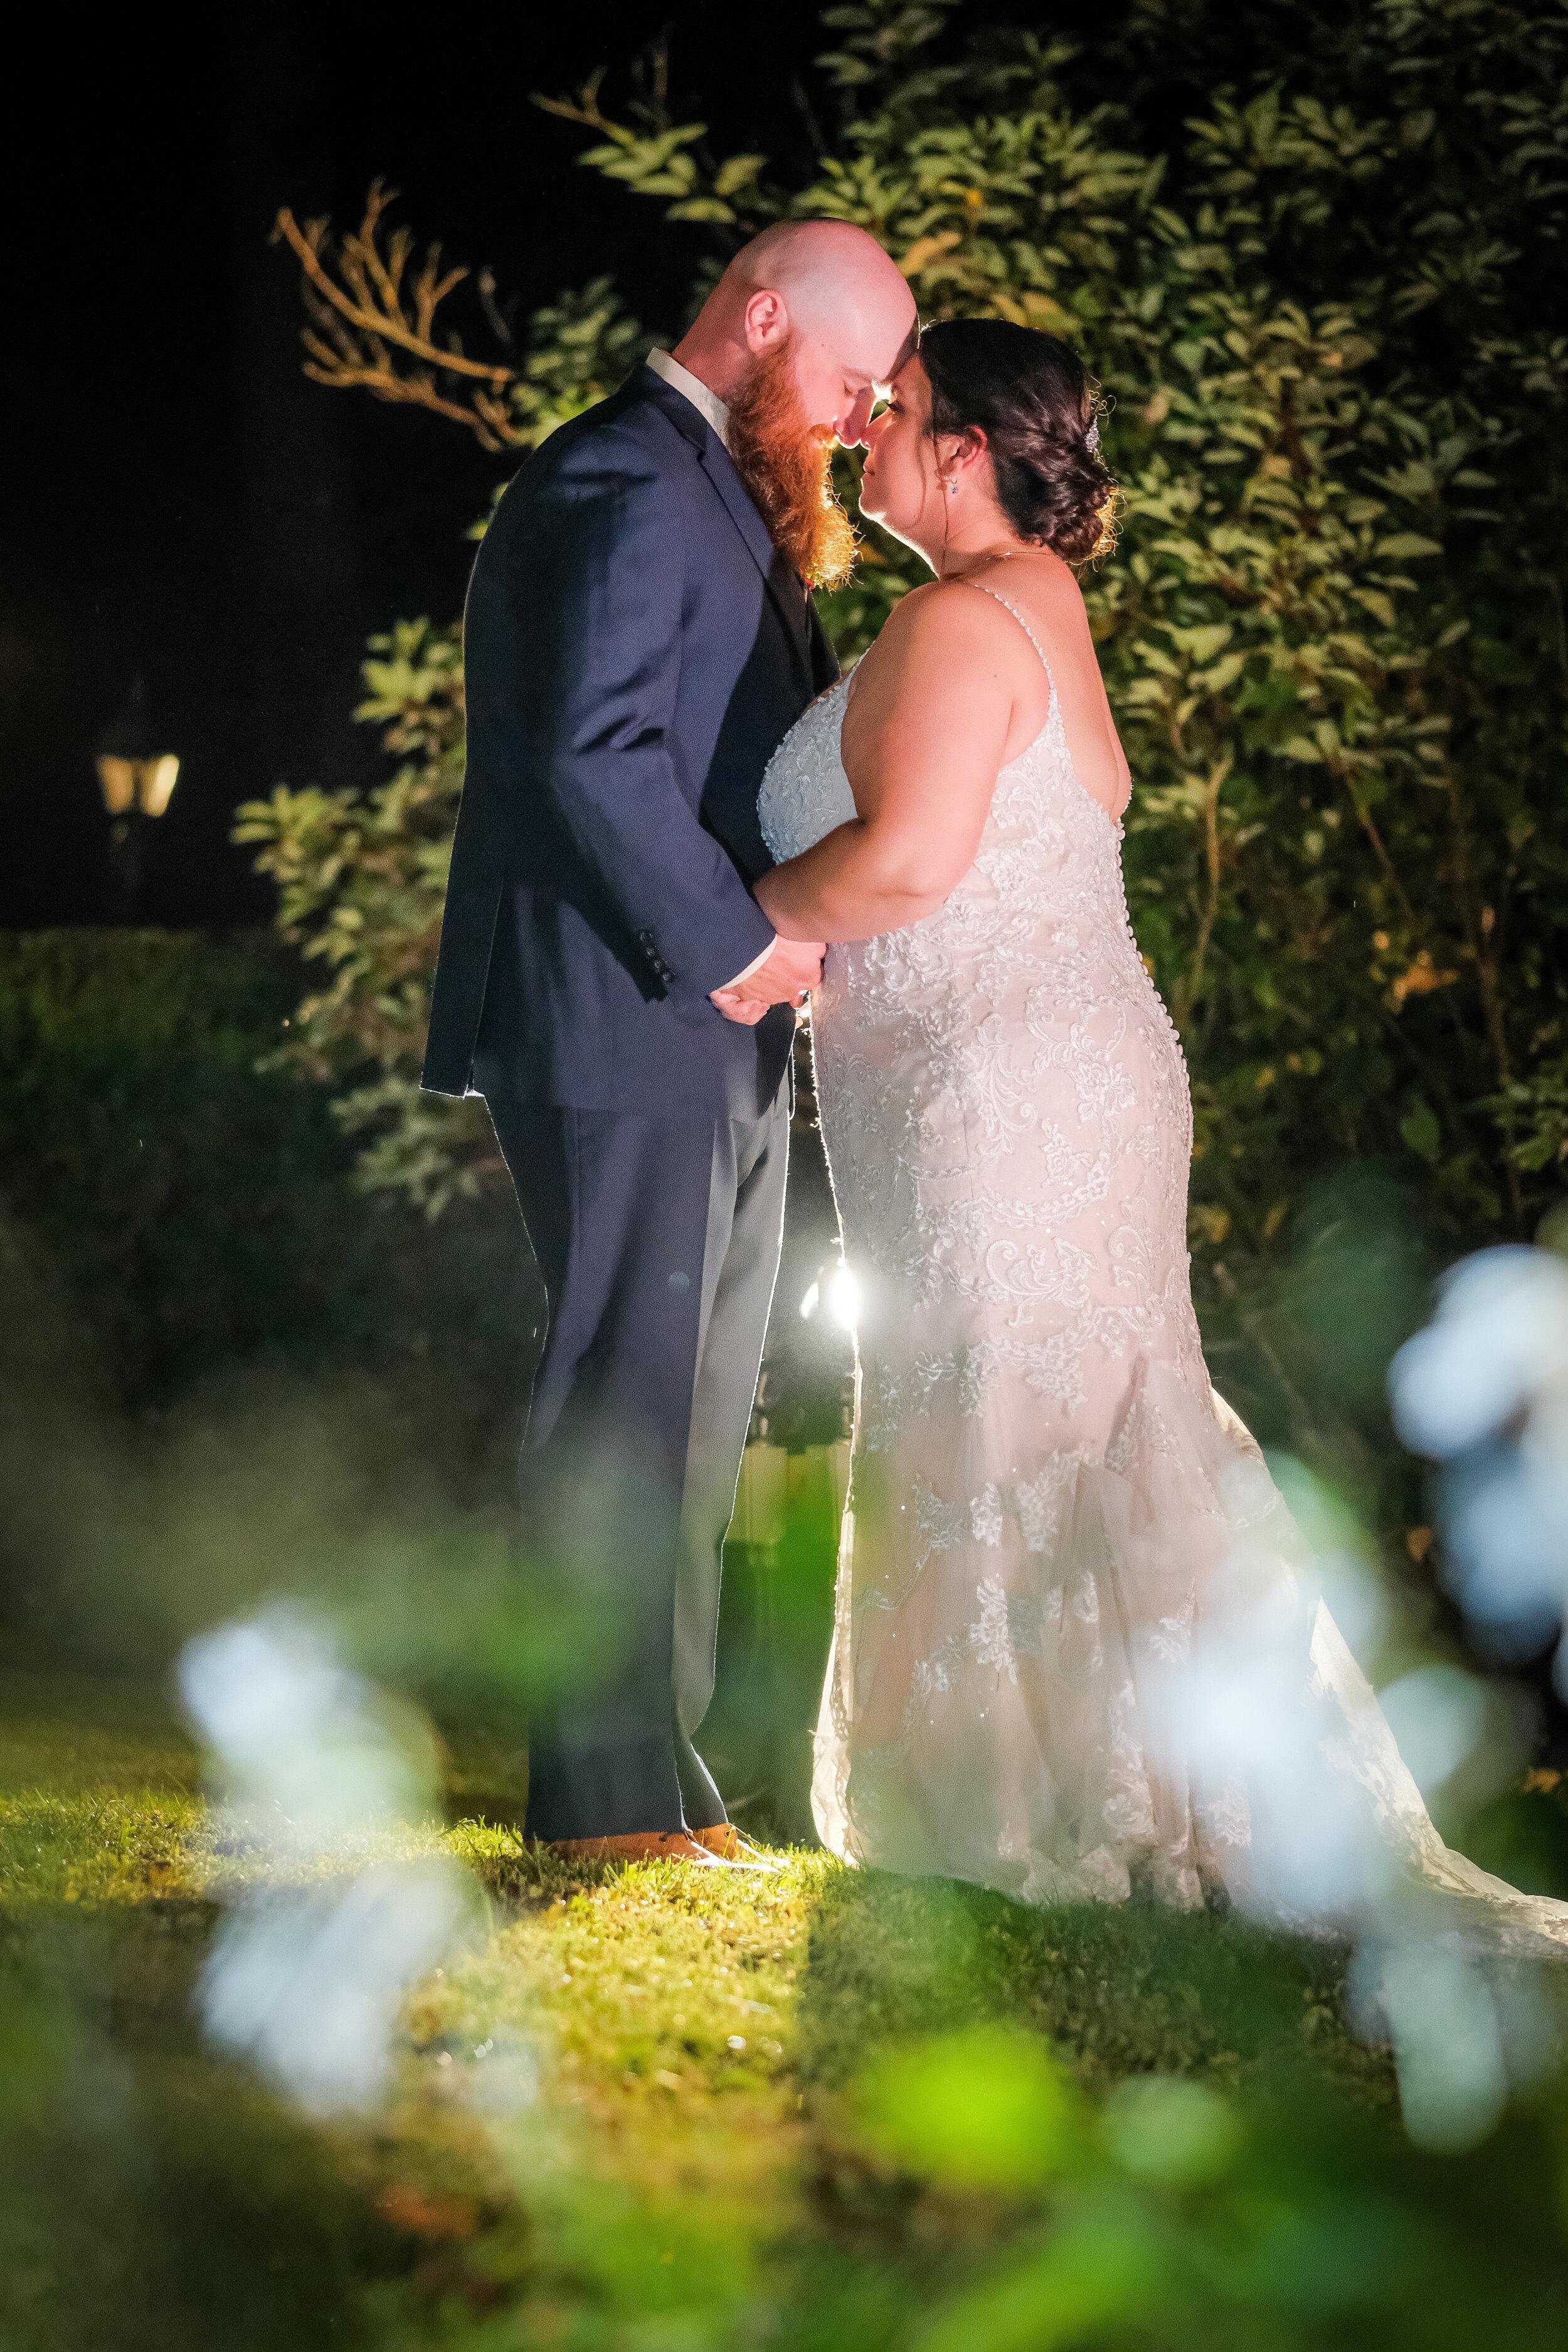 three-chimneys-inn-wedding-photography-1188.jpg